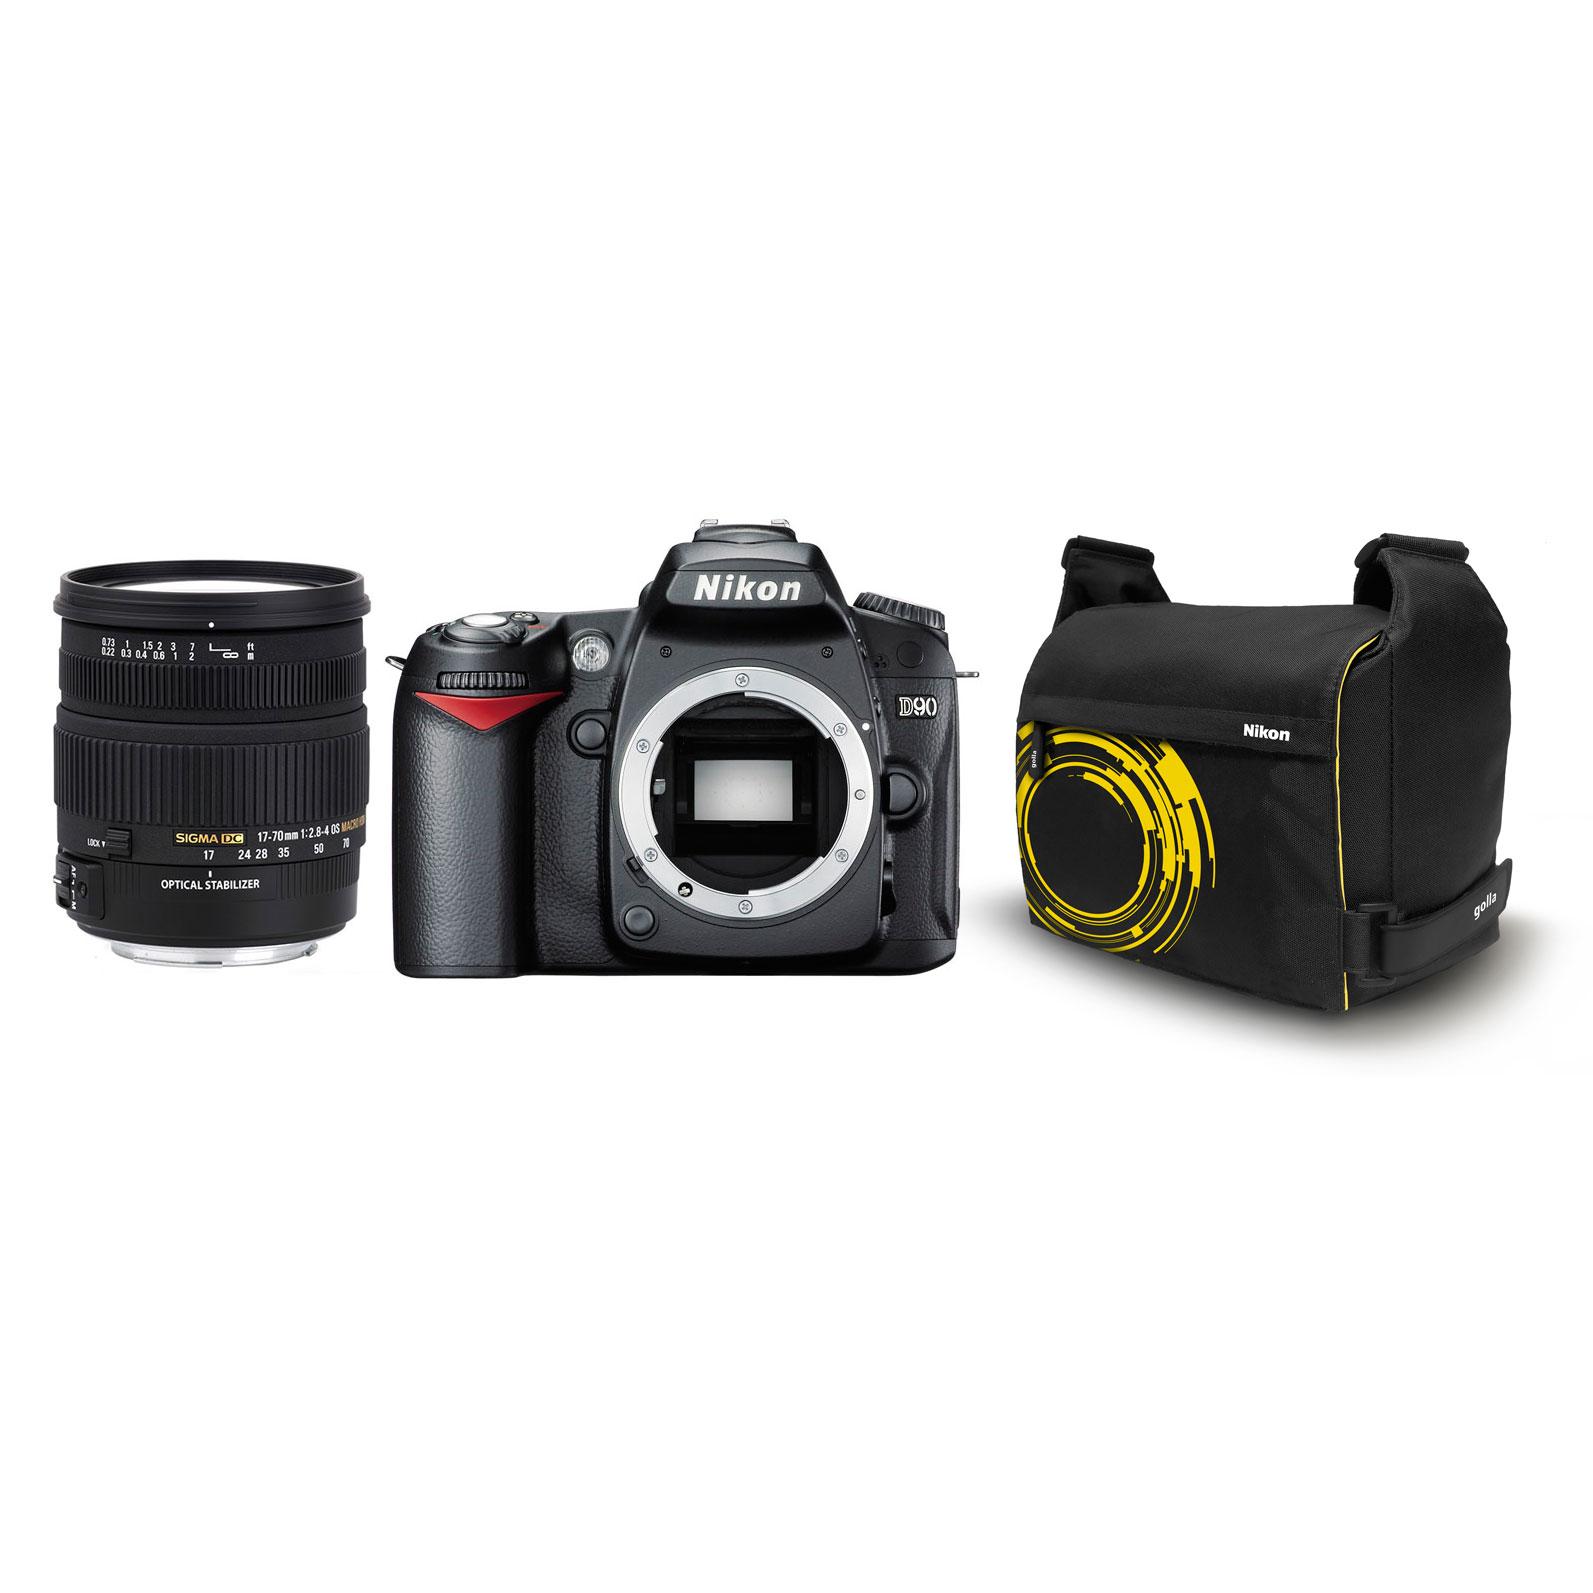 Appareil photo Reflex Nikon D90 + SIGMA 17-70mm F2,8-4 DC Macro OS HSM + Fourre-tout Nikon Golla Nikon D90 + SIGMA 17-70mm F2,8-4 DC Macro OS HSM + Fourre-tout Nikon Golla